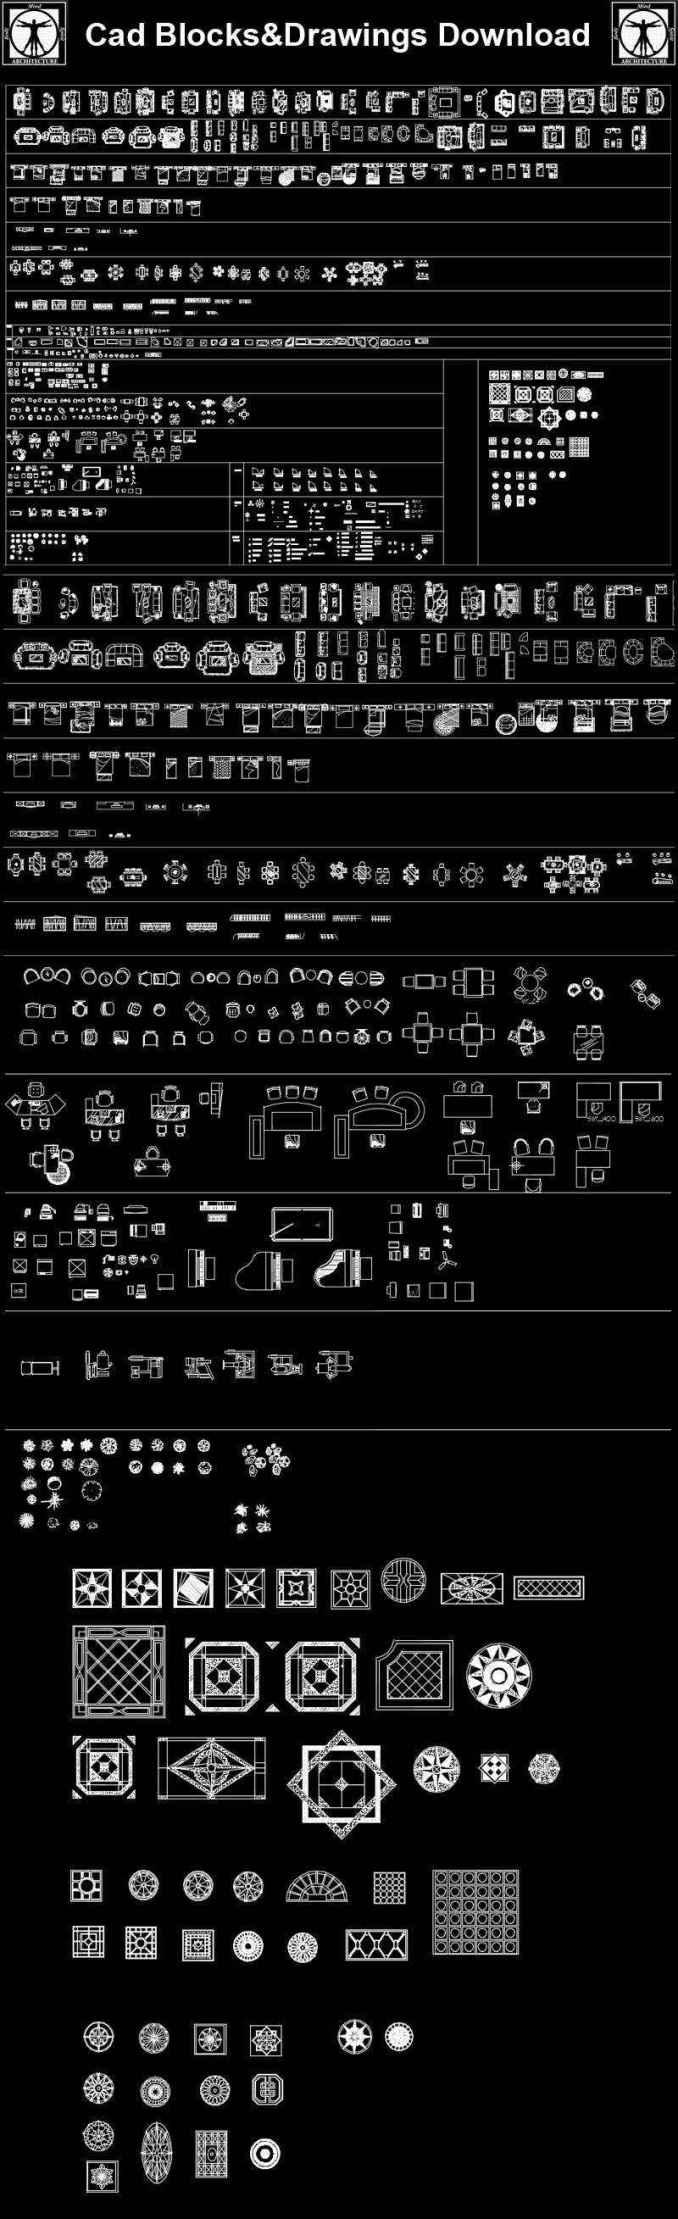 Interior Design Cad Collection Download Cad Blocks Drawings Details 3d Psd Blocks